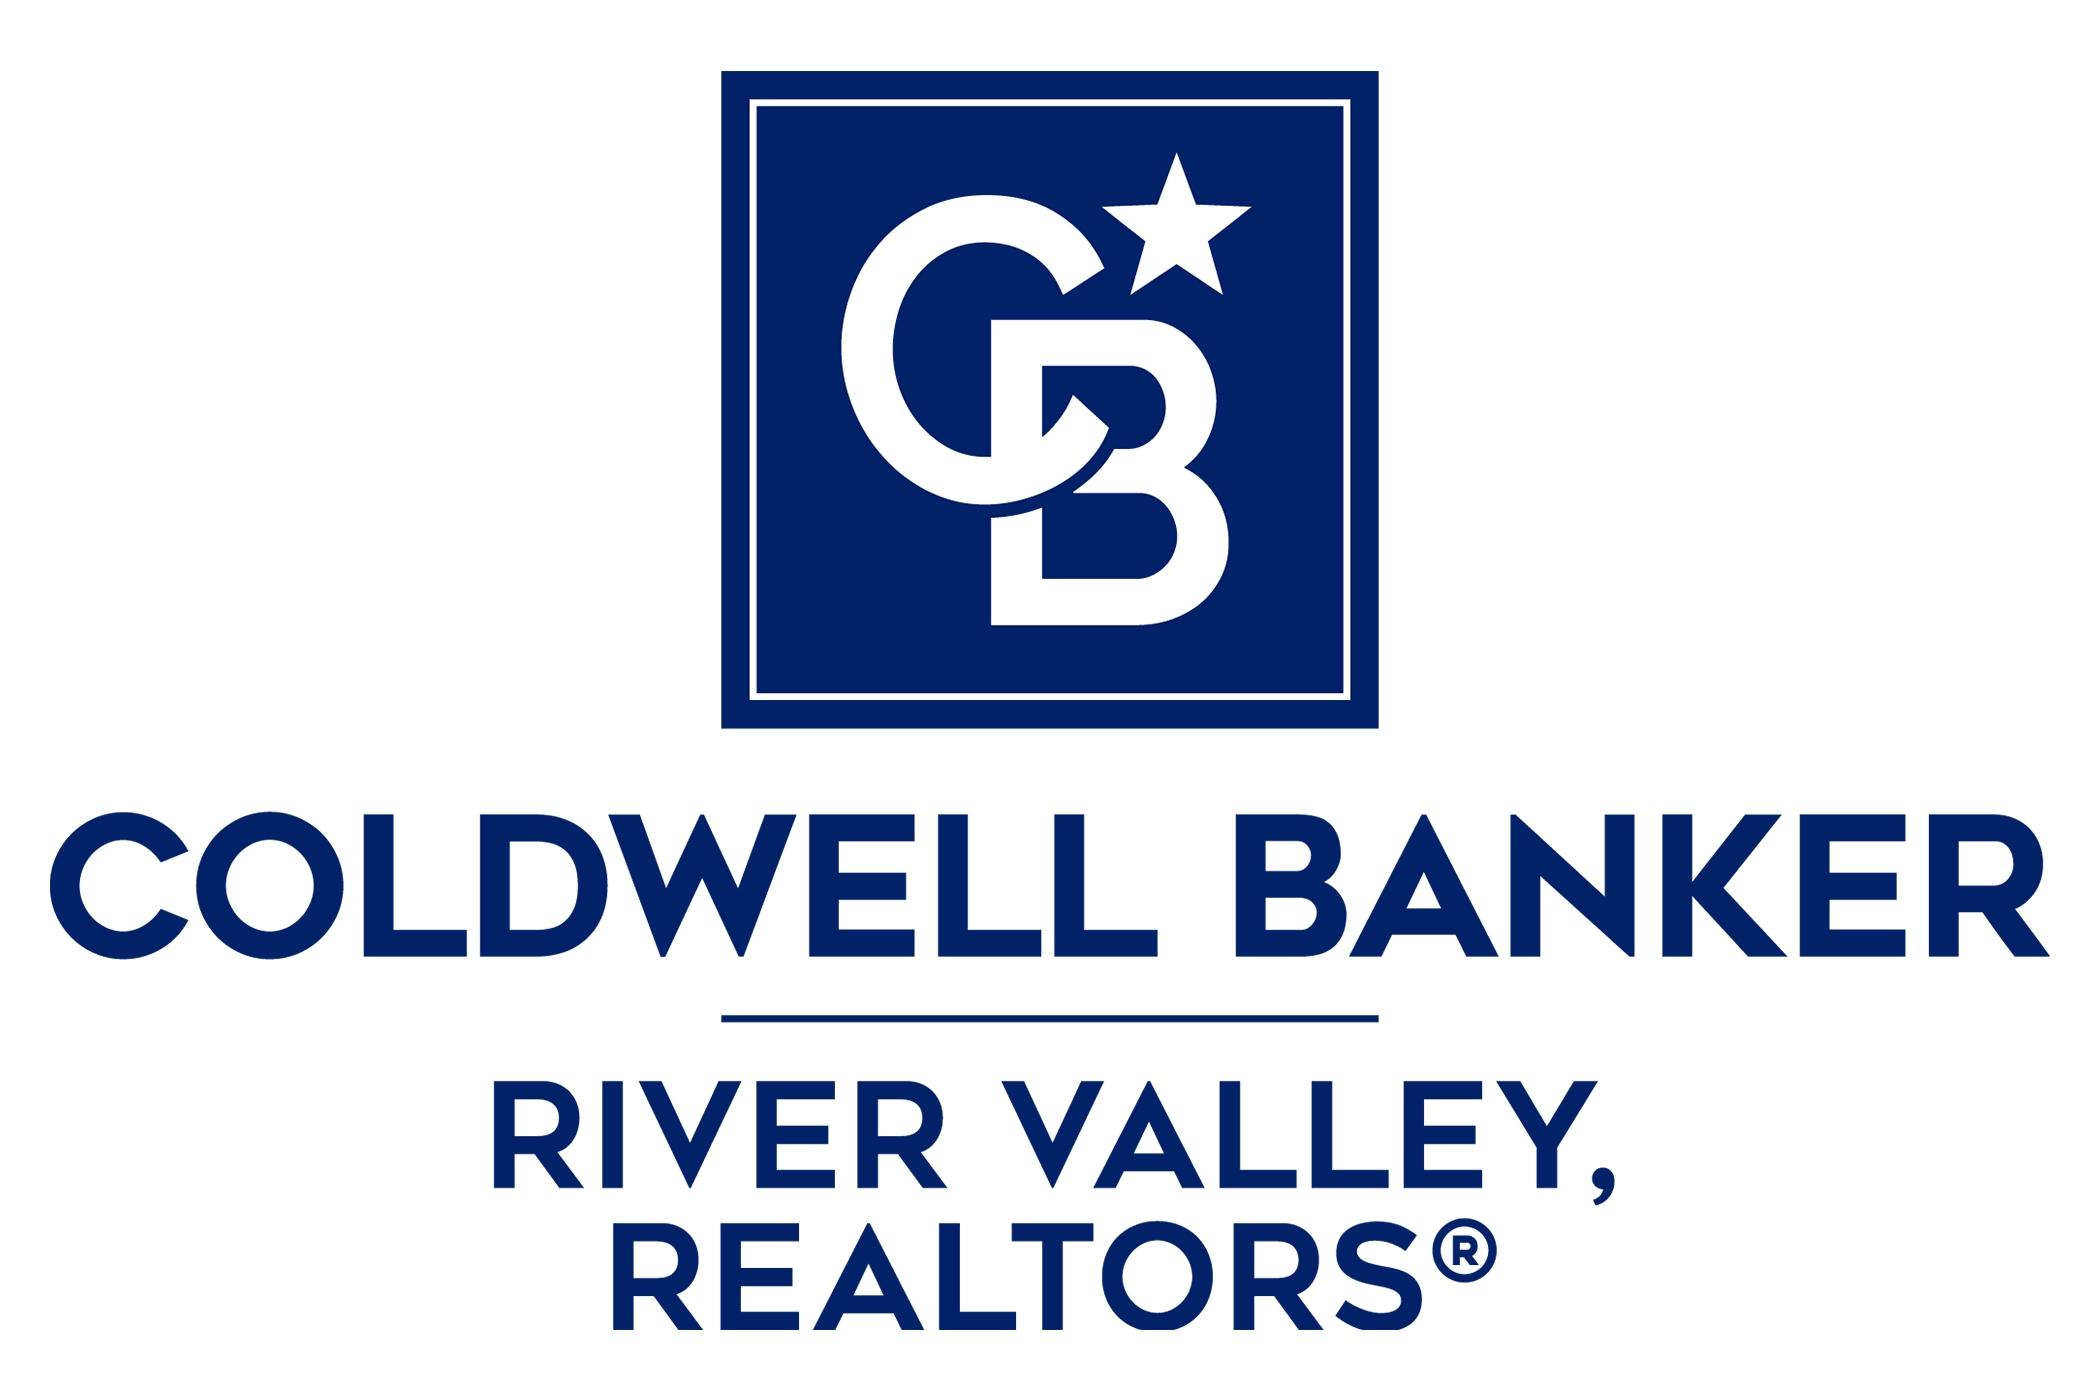 Kent Gabrielsen - Coldwell Banker River Valley, REALTORS Logo